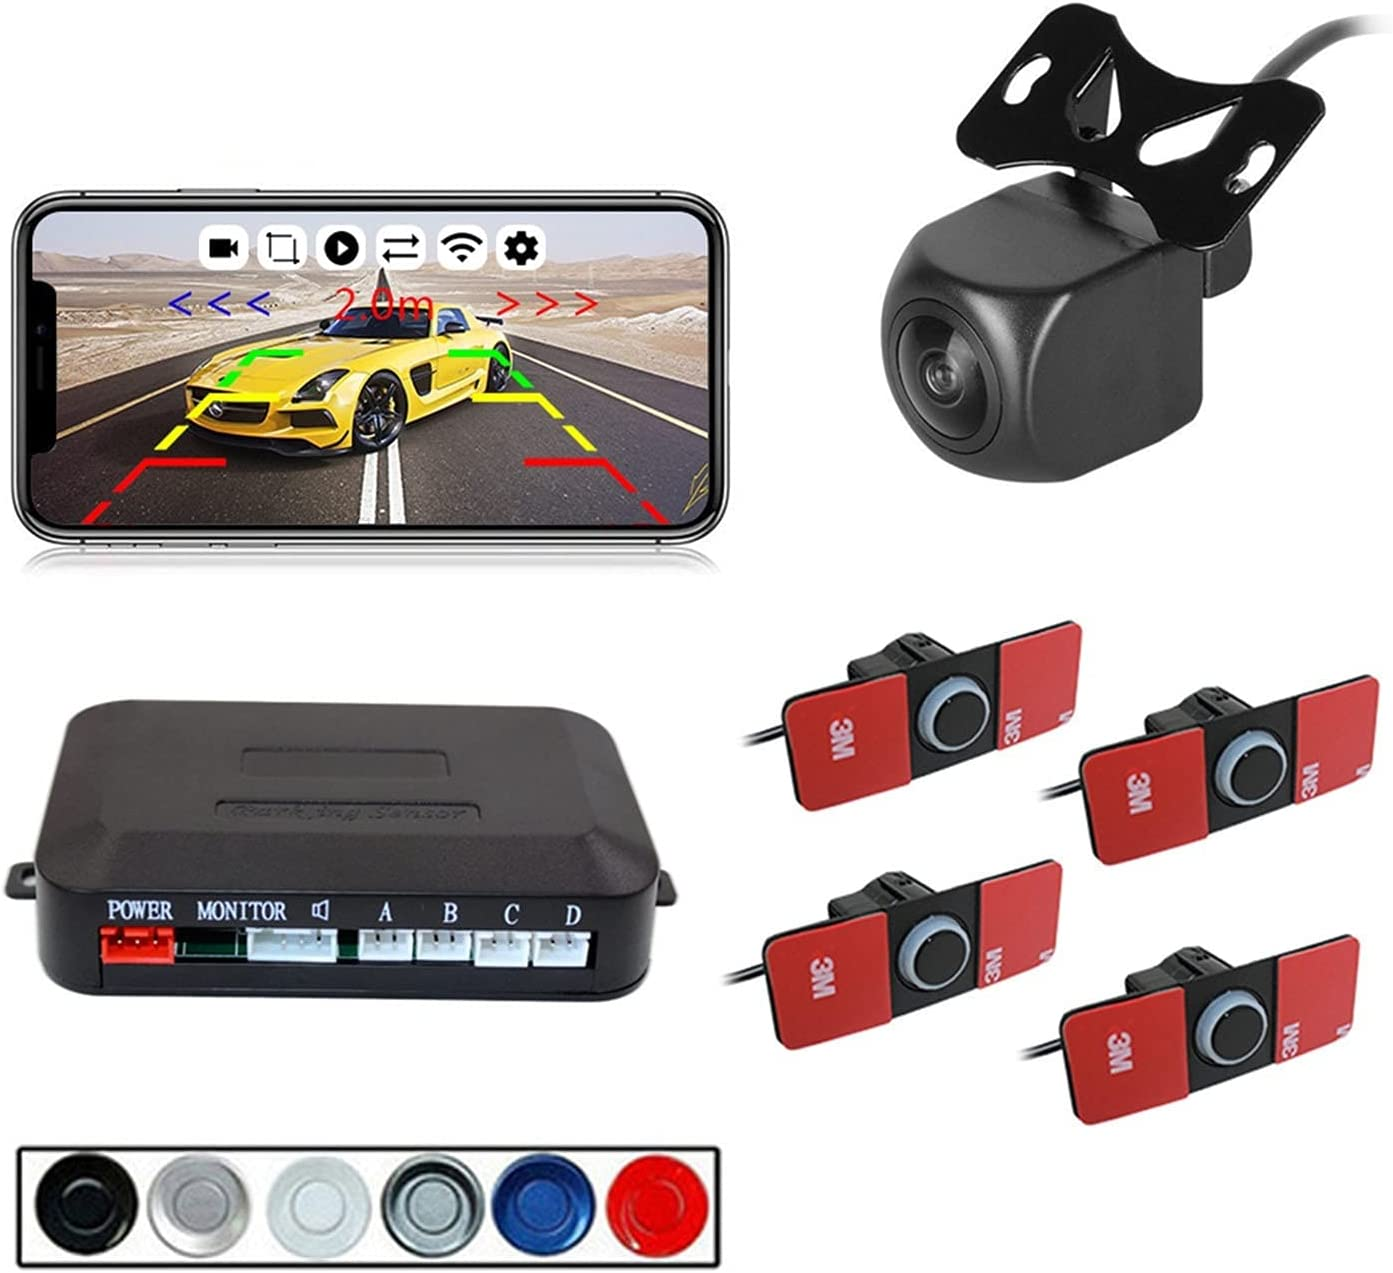 YXZQ Same day shipping Handheld GPS Max 51% OFF Detector 12V 16.5mm Sensor Parking Probe Car 4